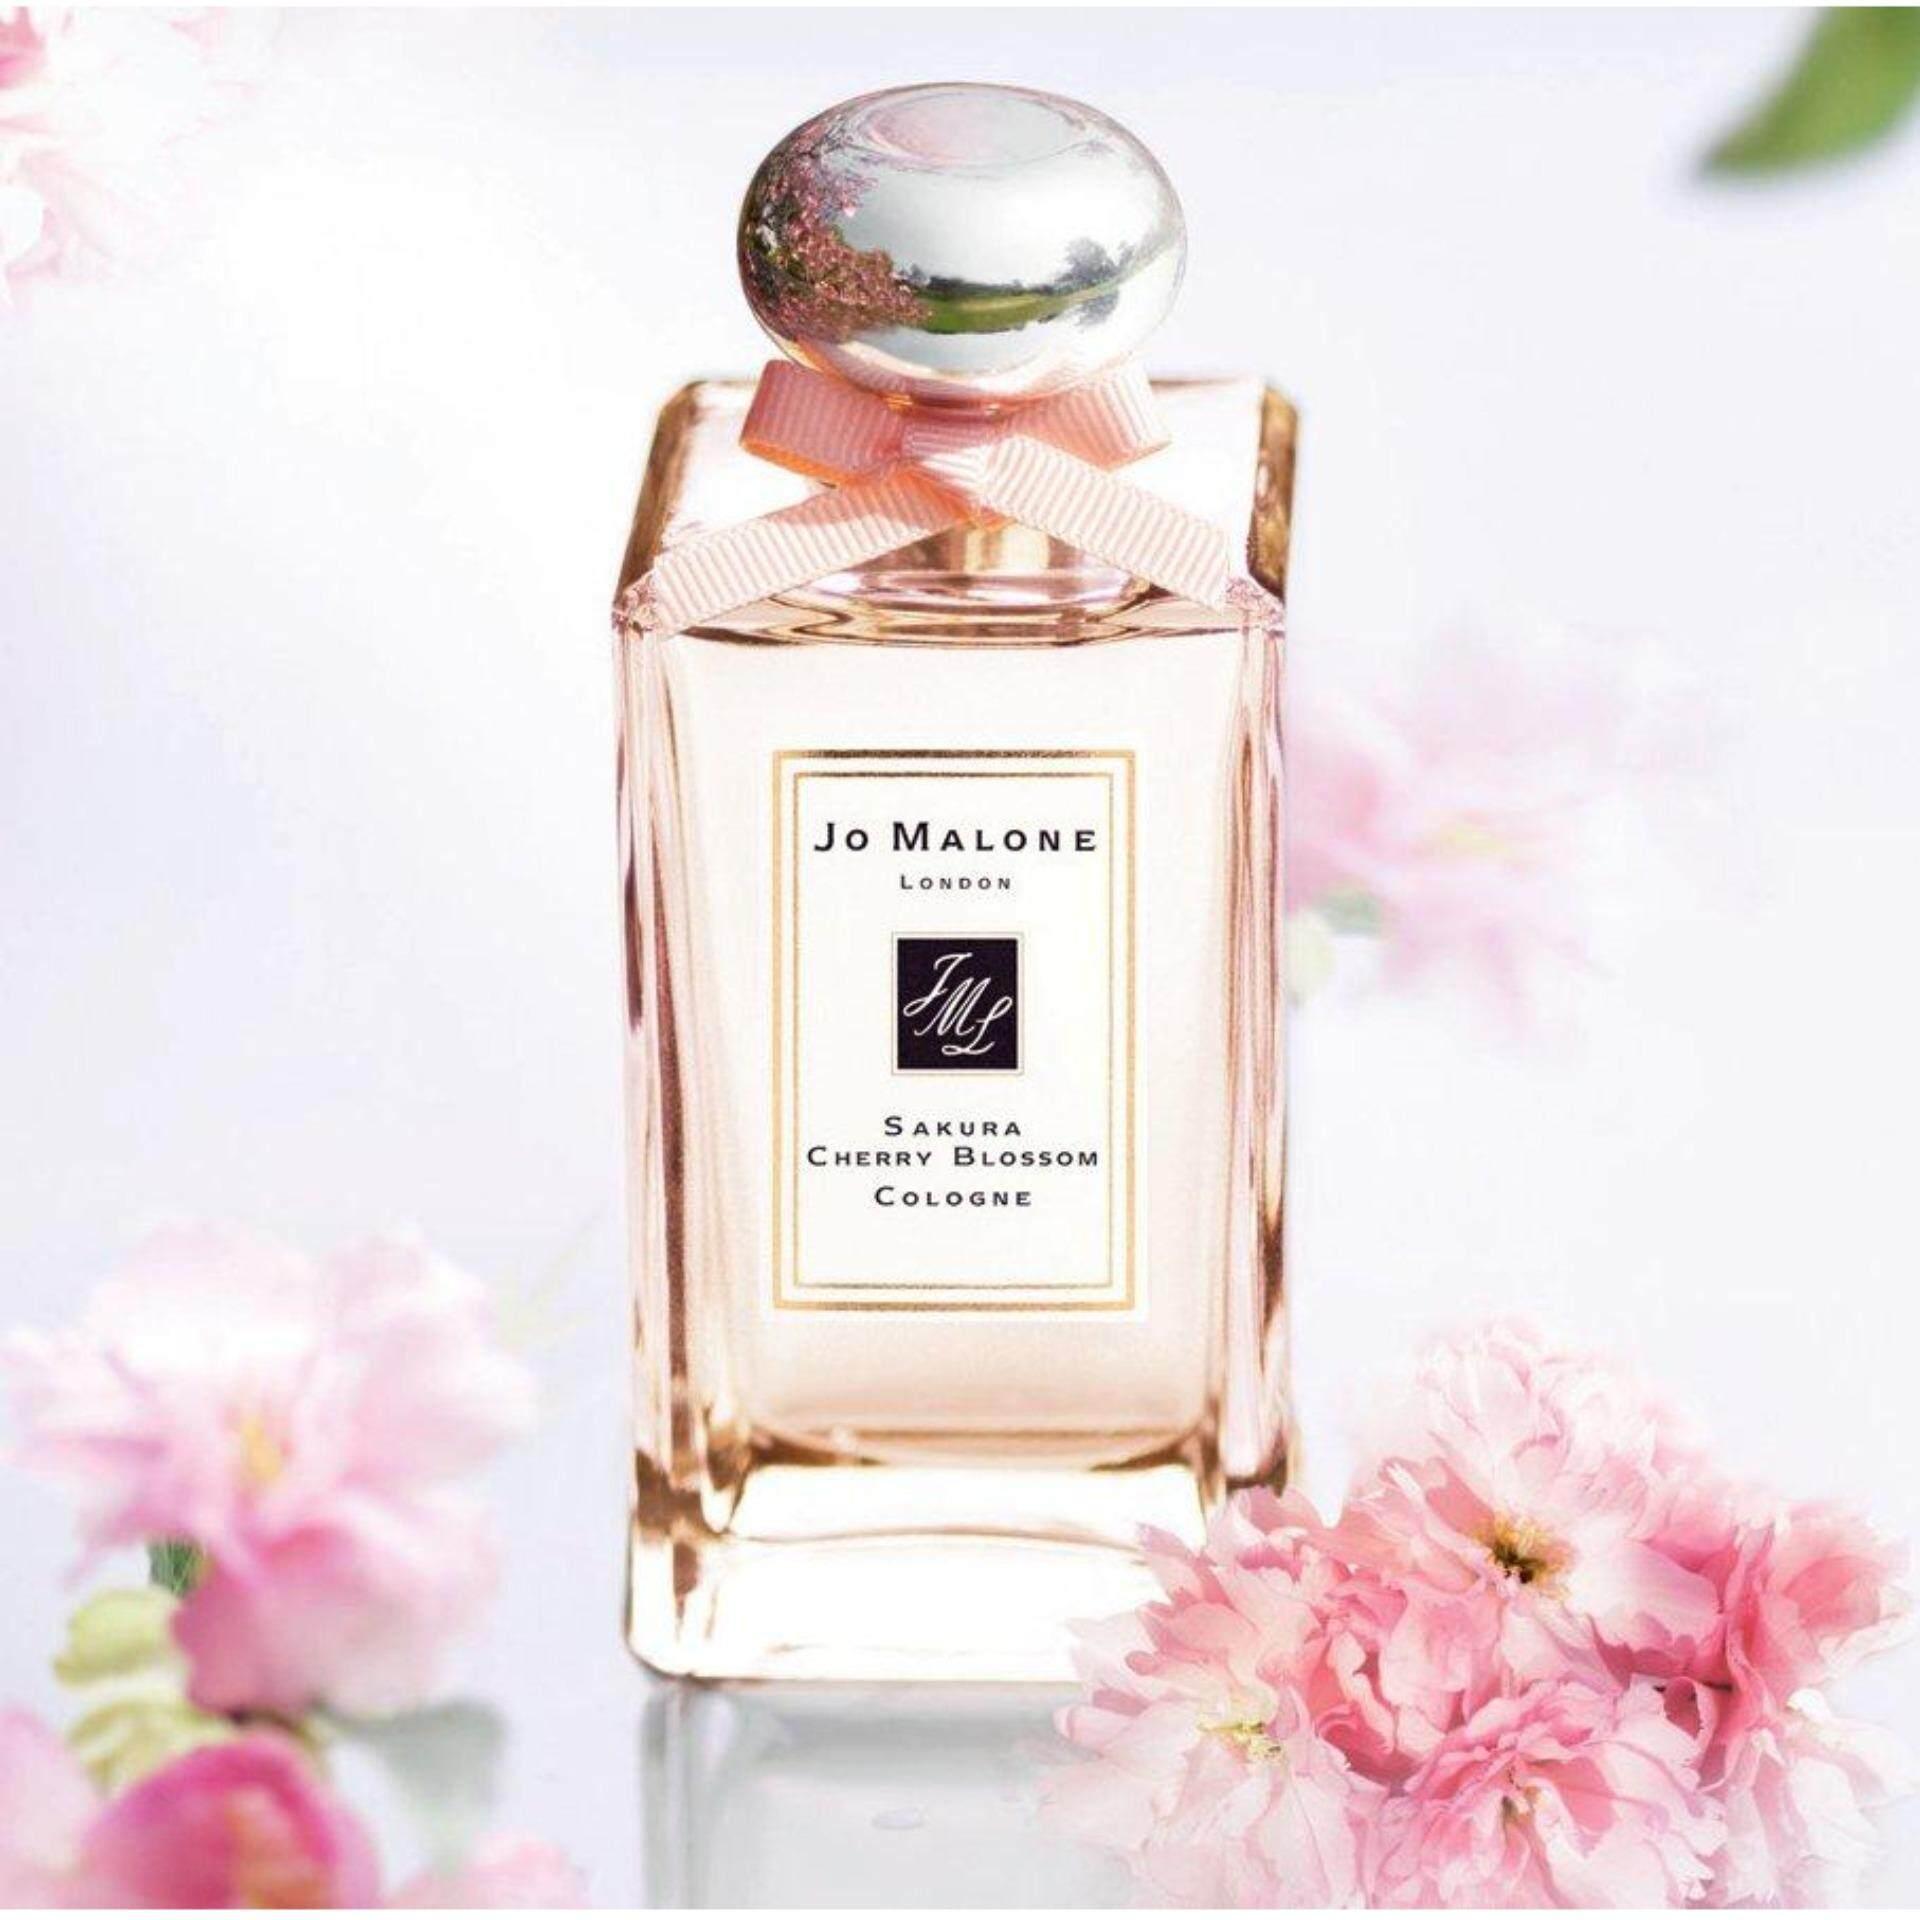 Sakura Cherry Blossom Cologne by Jo Malone For Women 100ml